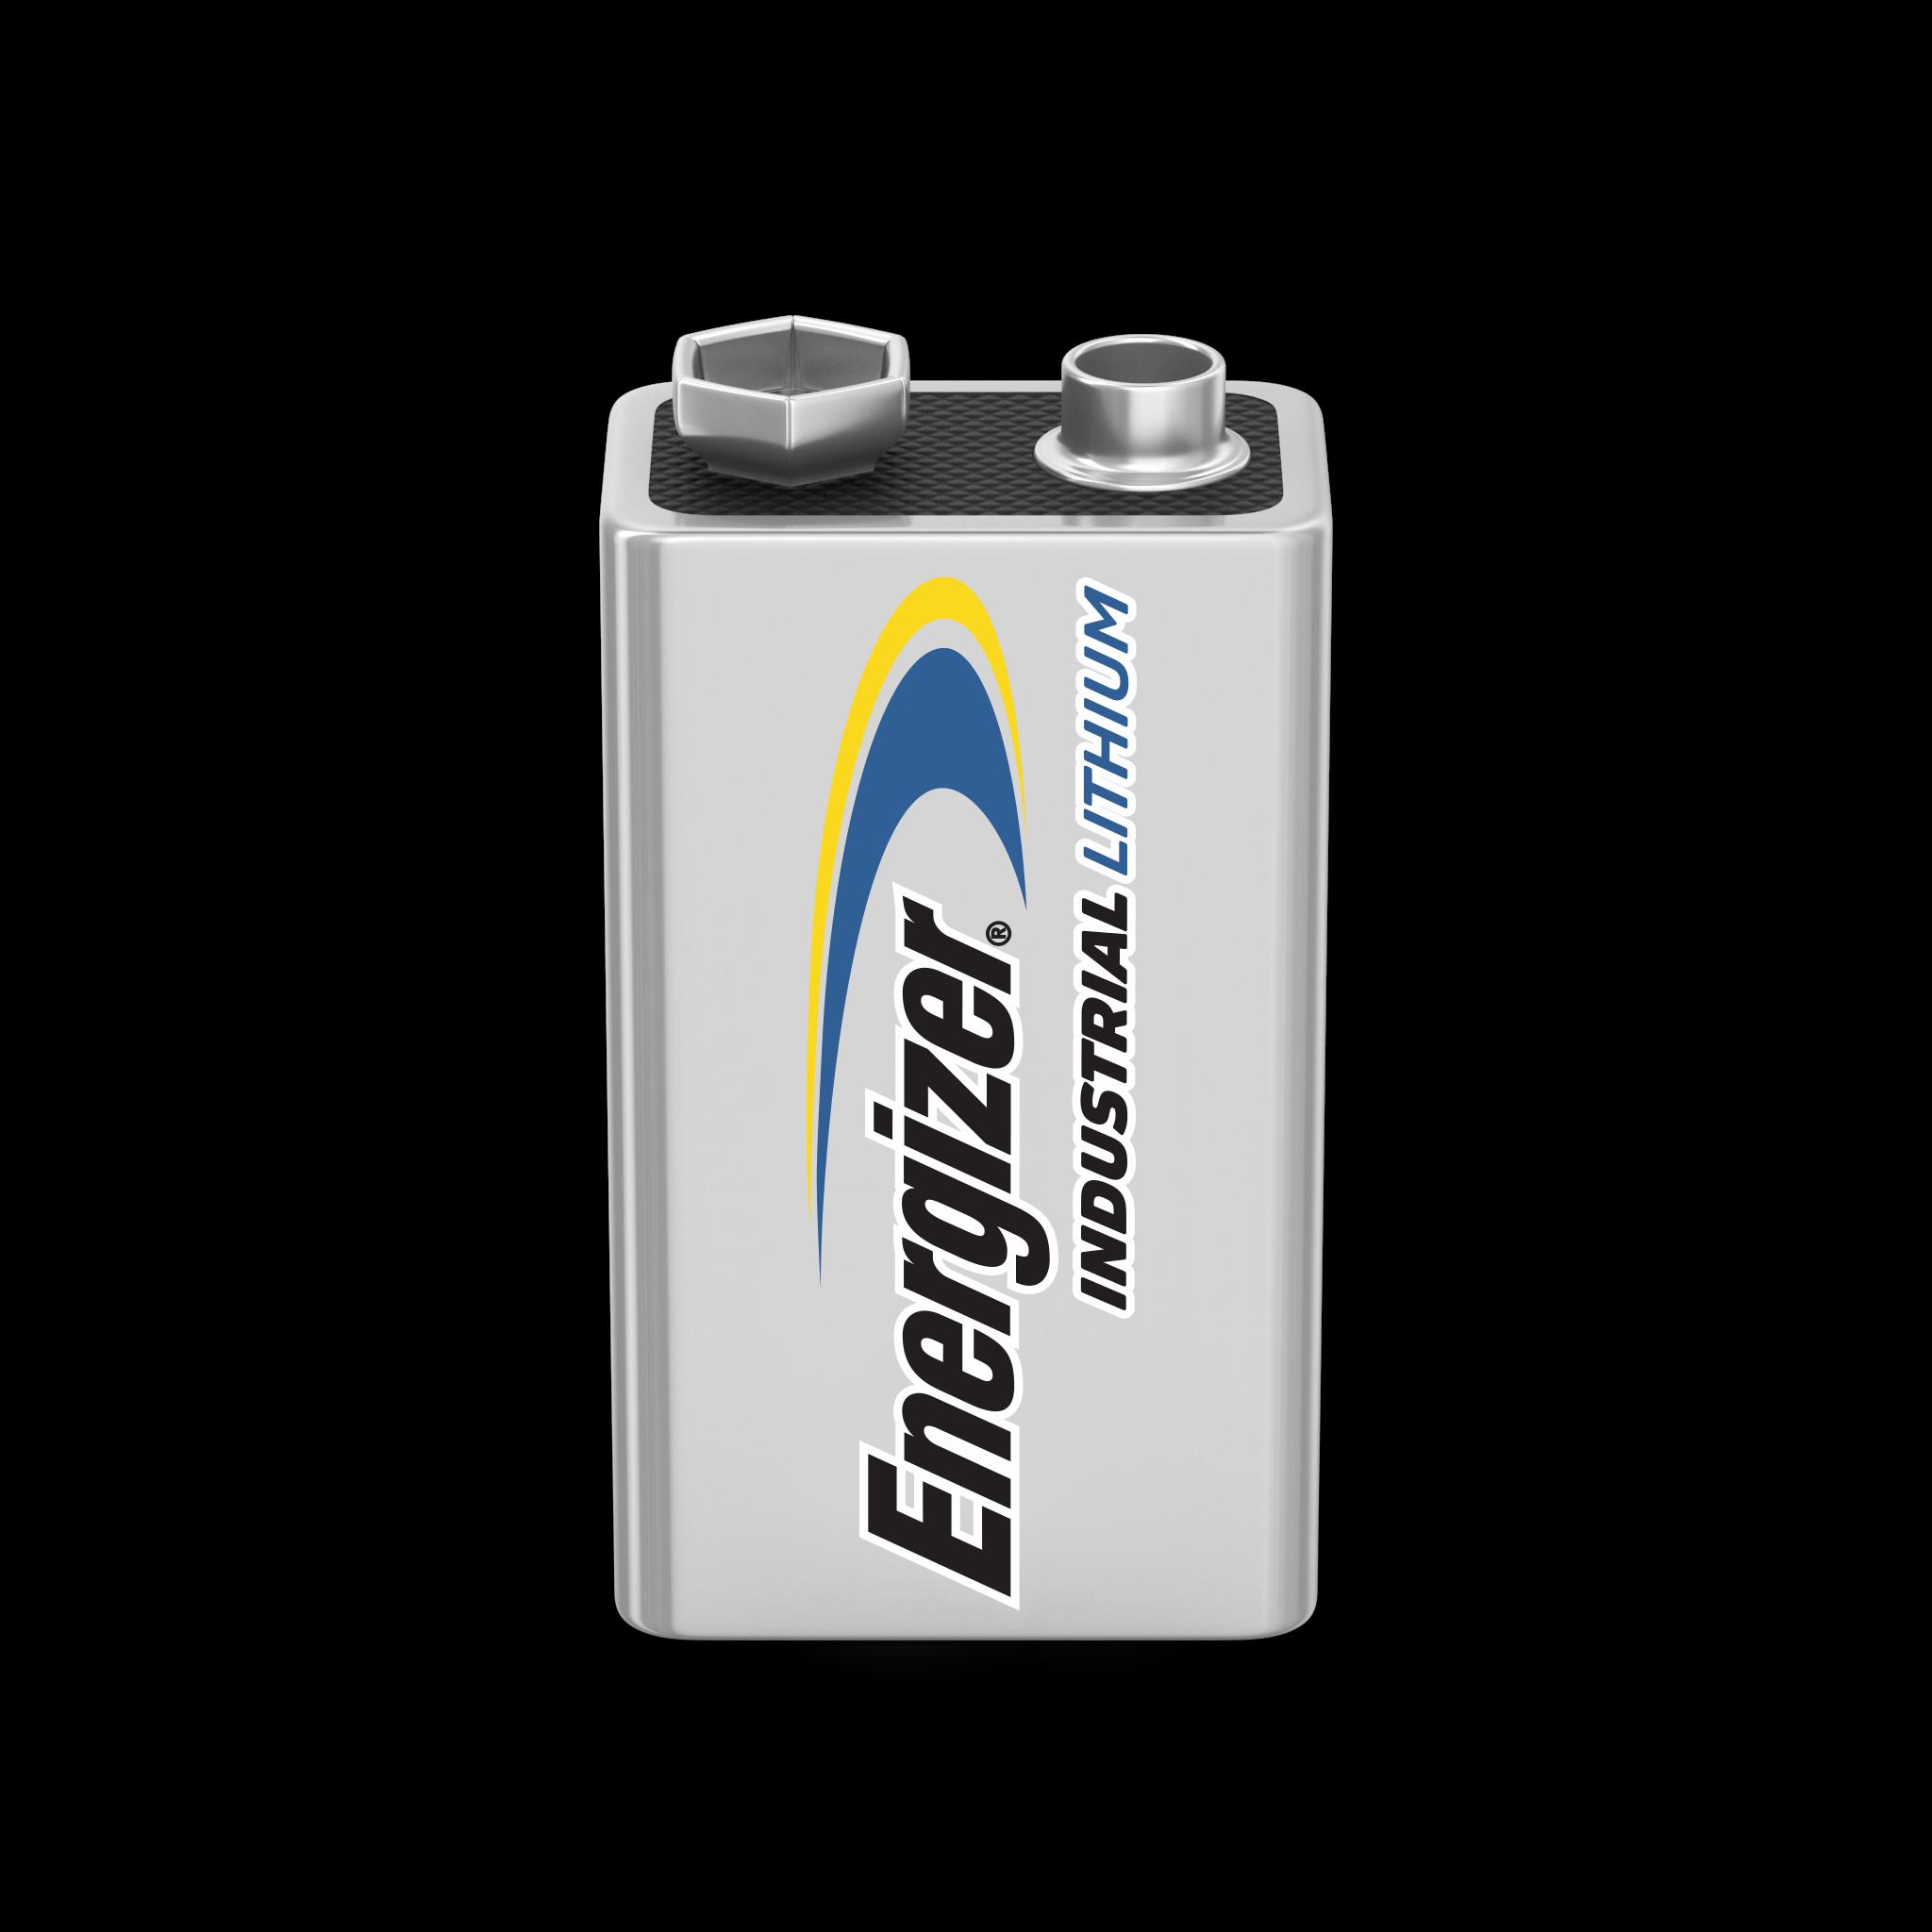 Energizer Industrial Lithium 9V Battery